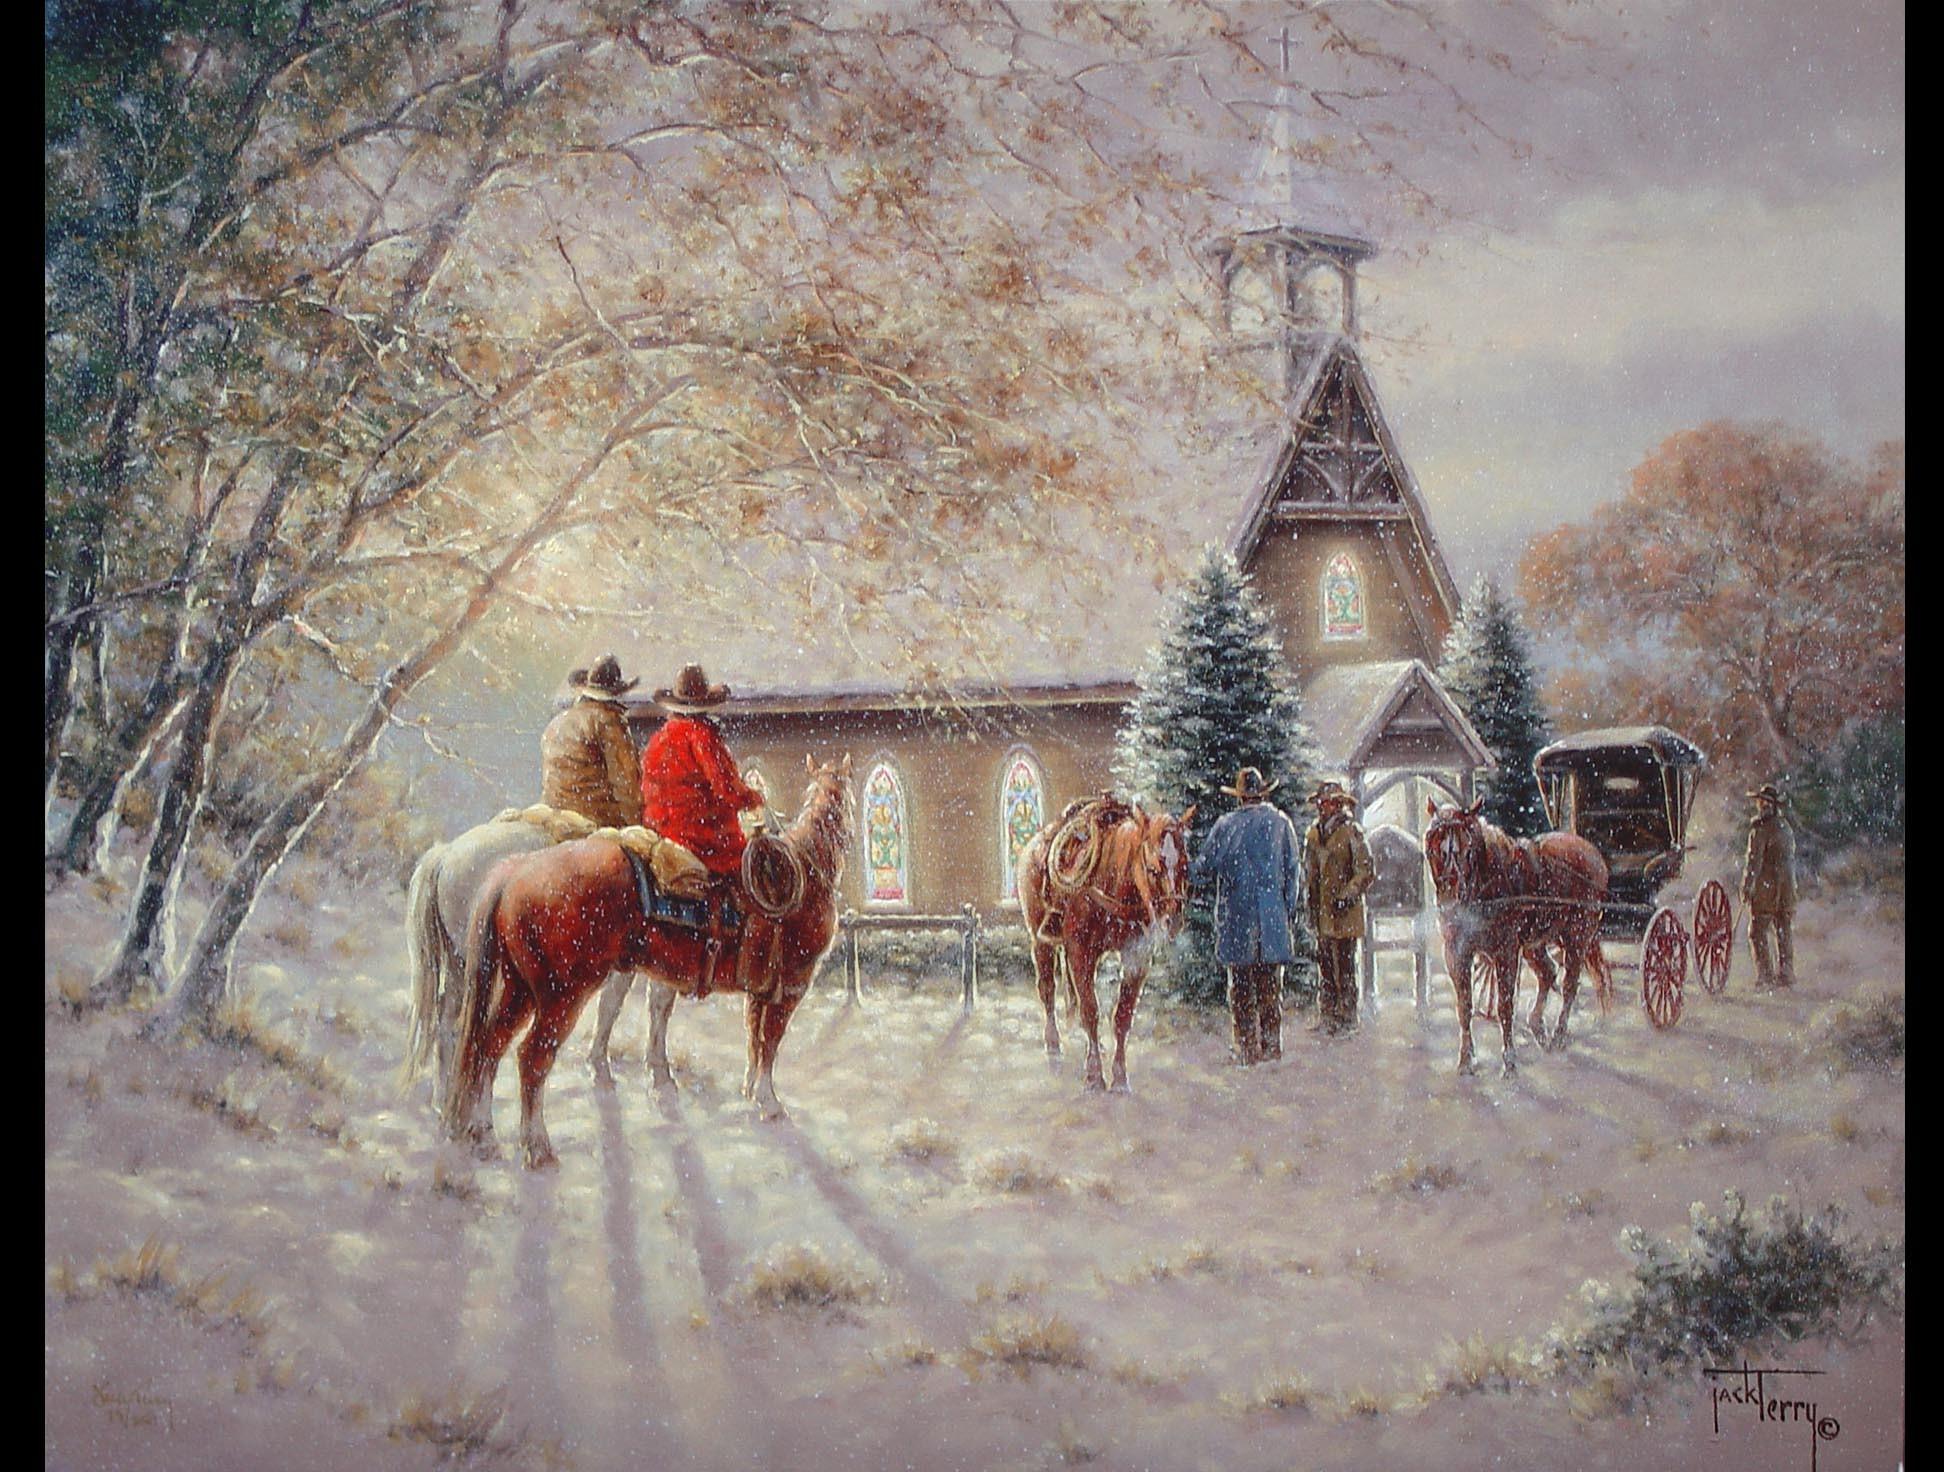 Cowboy Bebop Iphone X Wallpaper Western Christmas Background Wallpaper 49 Images